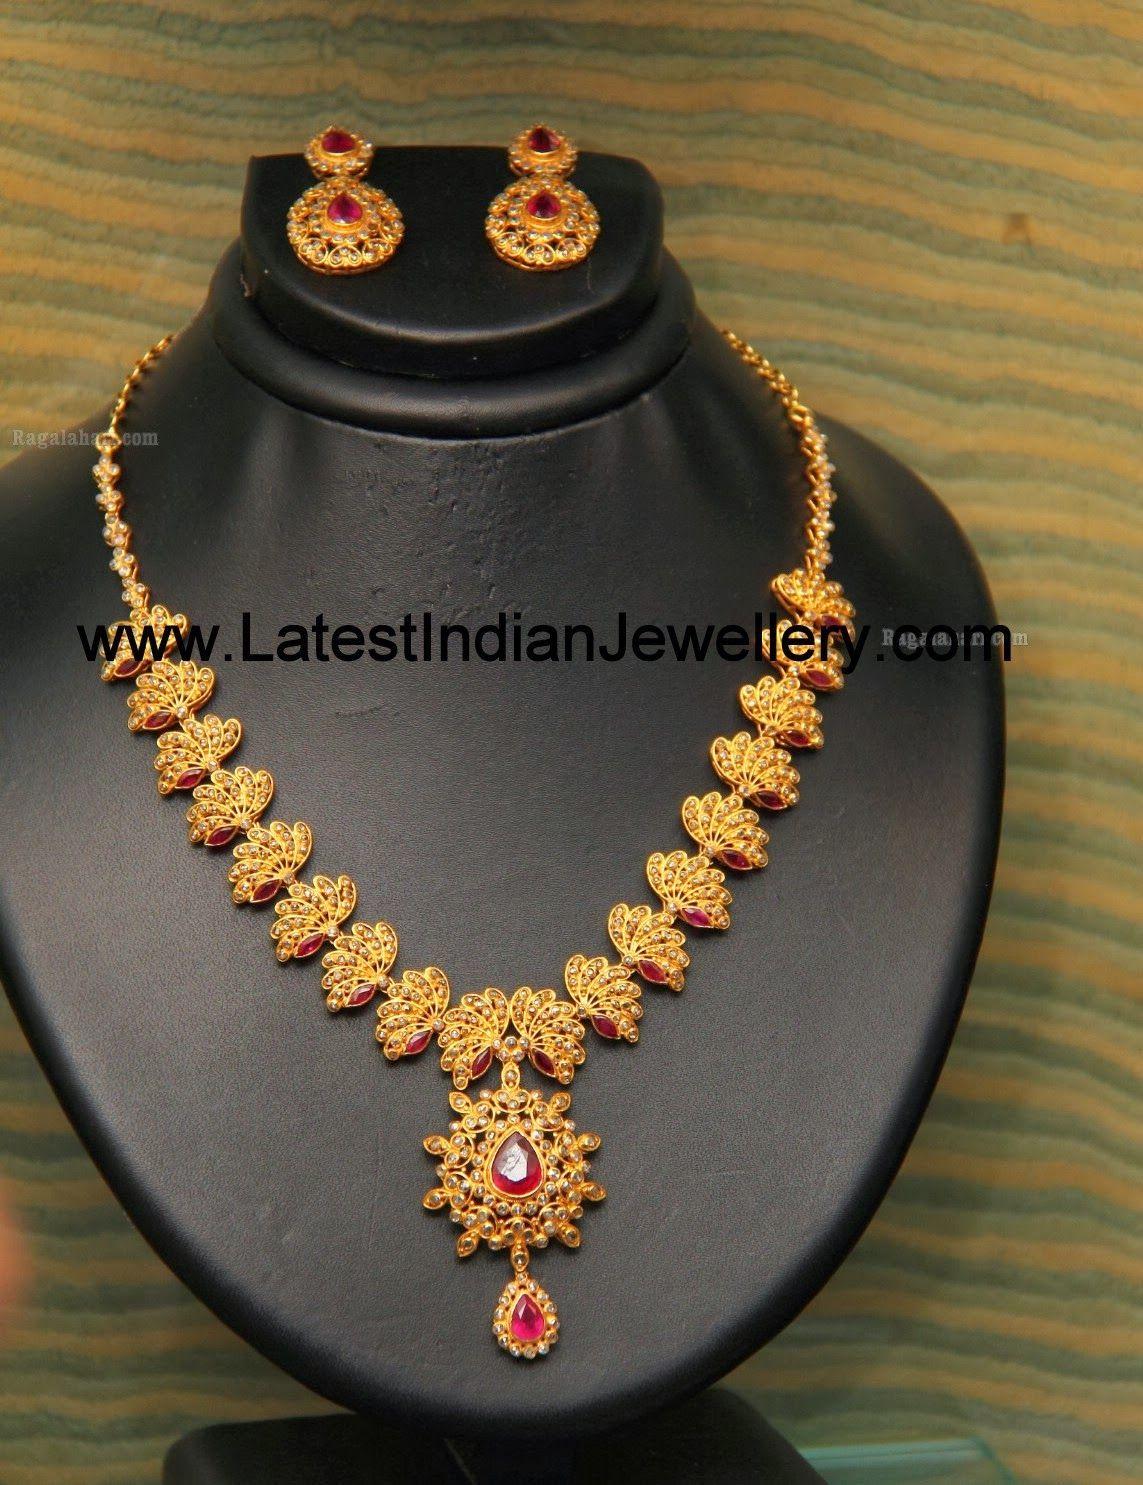 Gold necklace designs in grt jewellers - Designer Uncut Diamond Necklace In Lotus Design